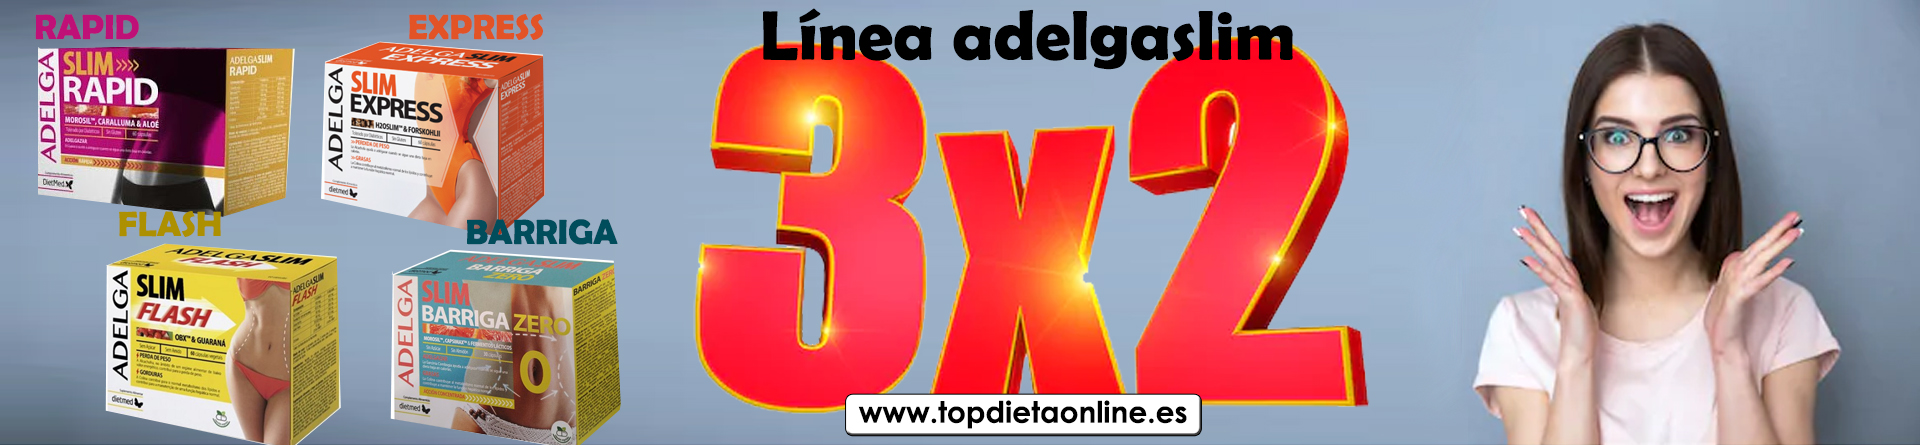 3x2 línea adelgaslim